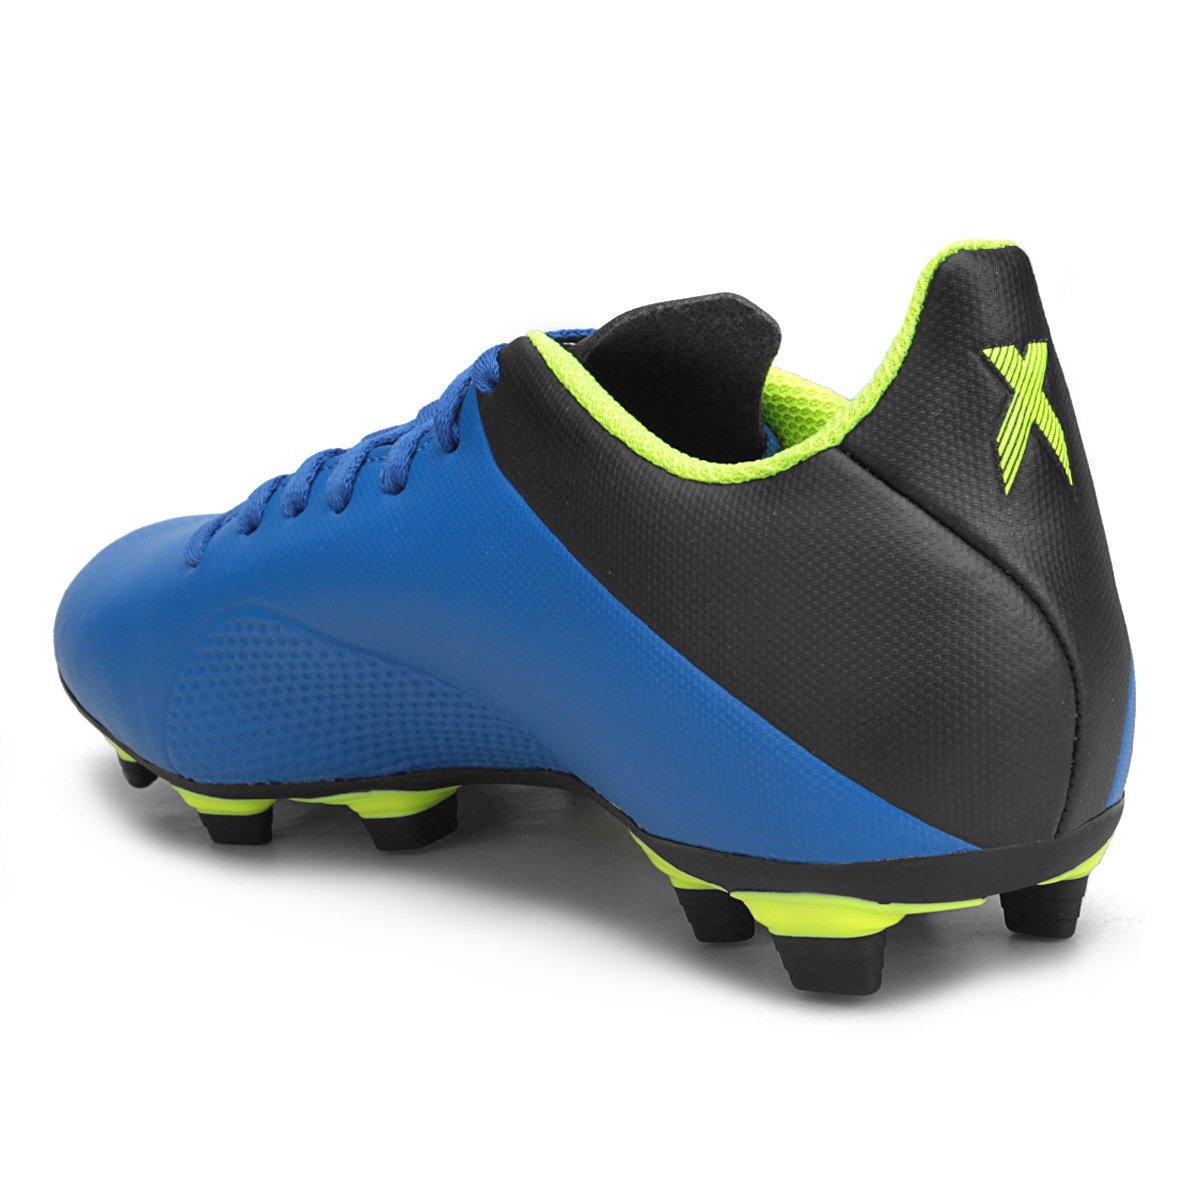 0db626d950 chuteira campo adidas x 18 1 fg masculina azul amarelo on wholesale ...